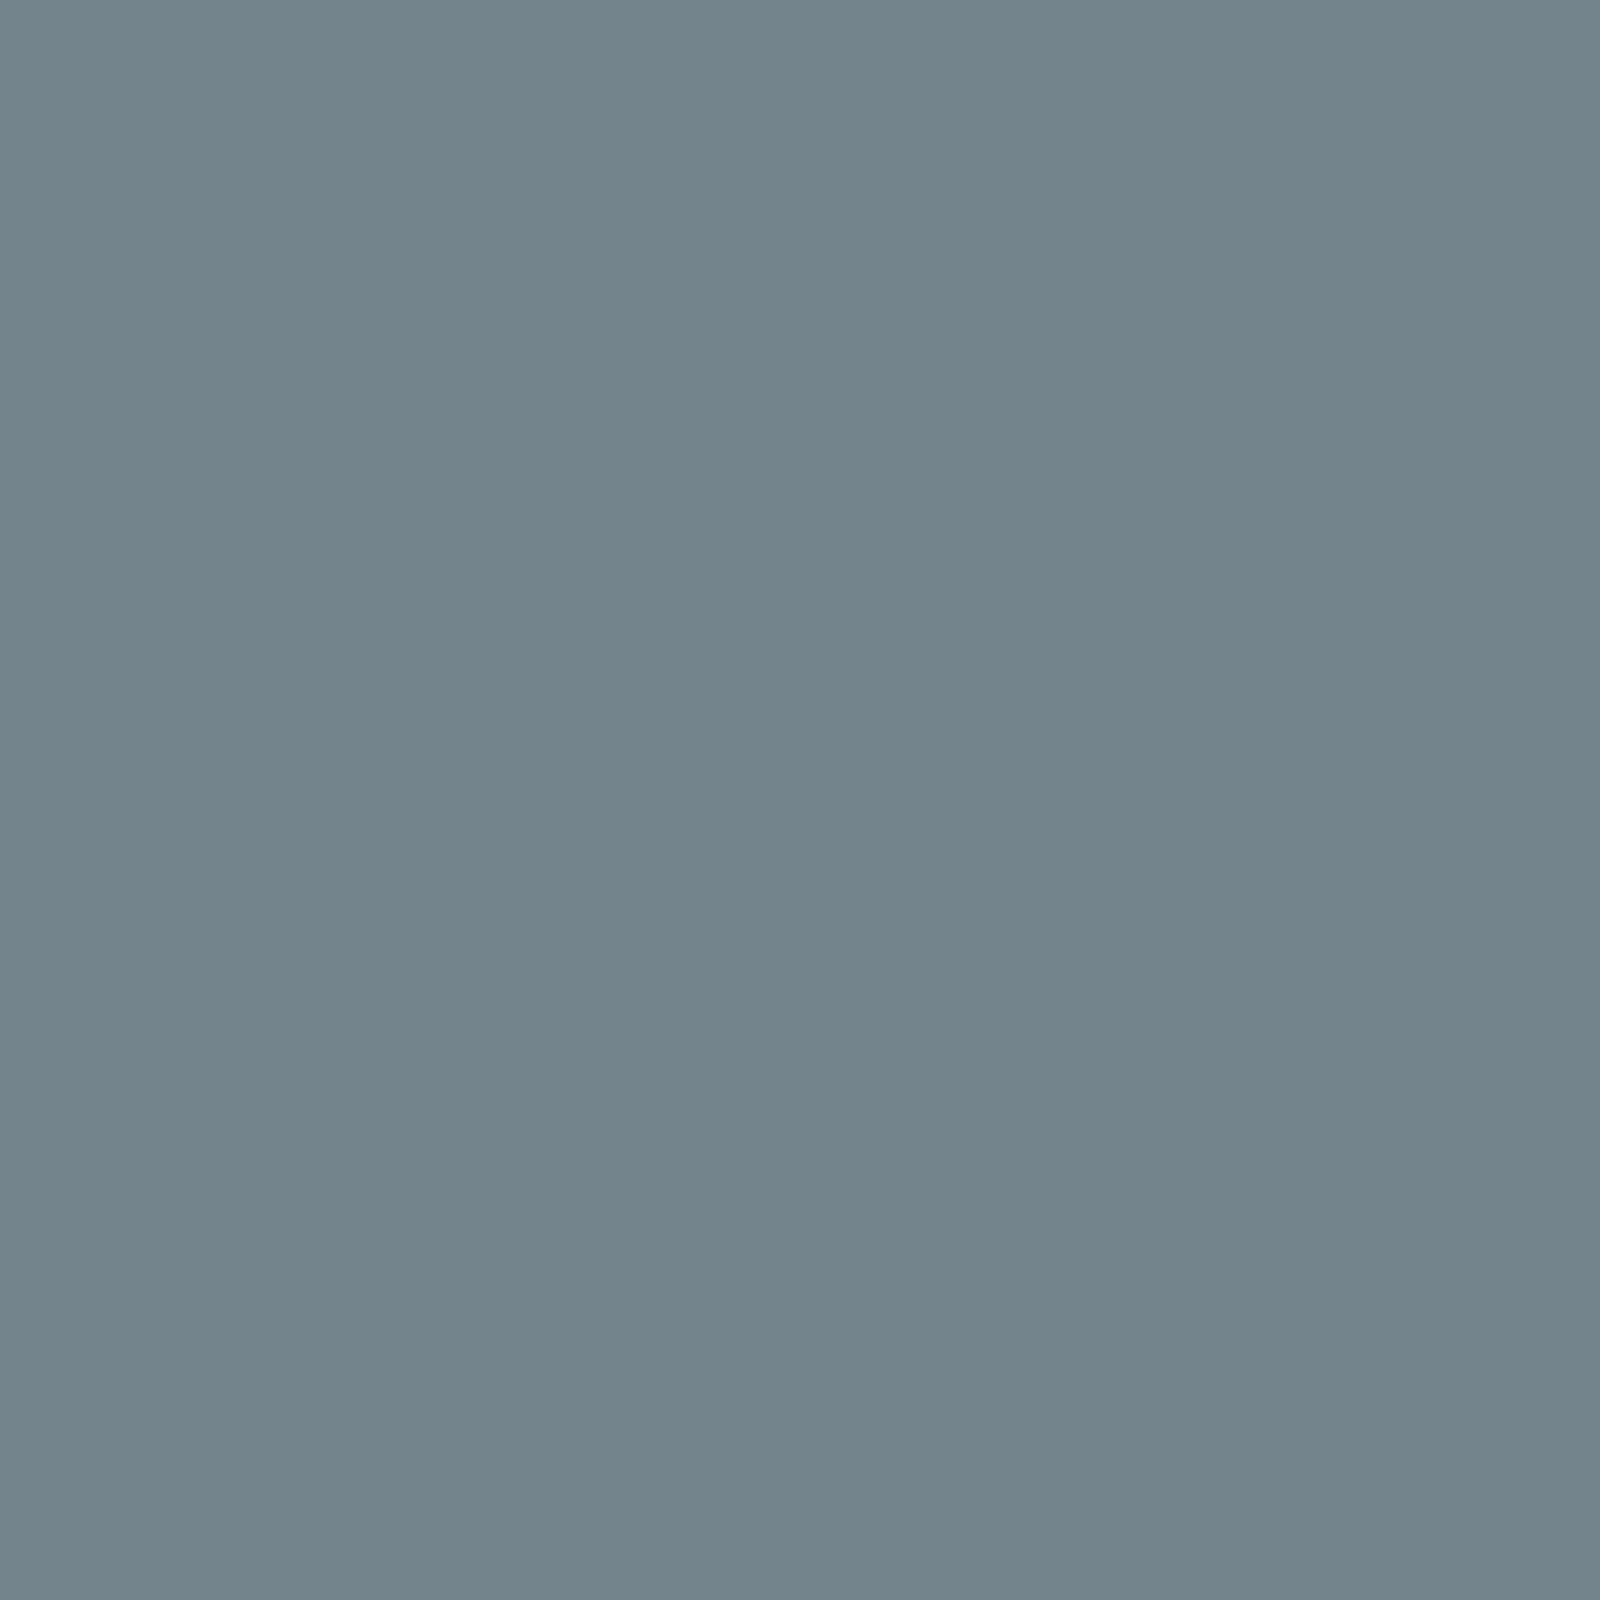 Grayish Blue Cosmo Floss  2981 Lt Grayish Blue  4975857607237